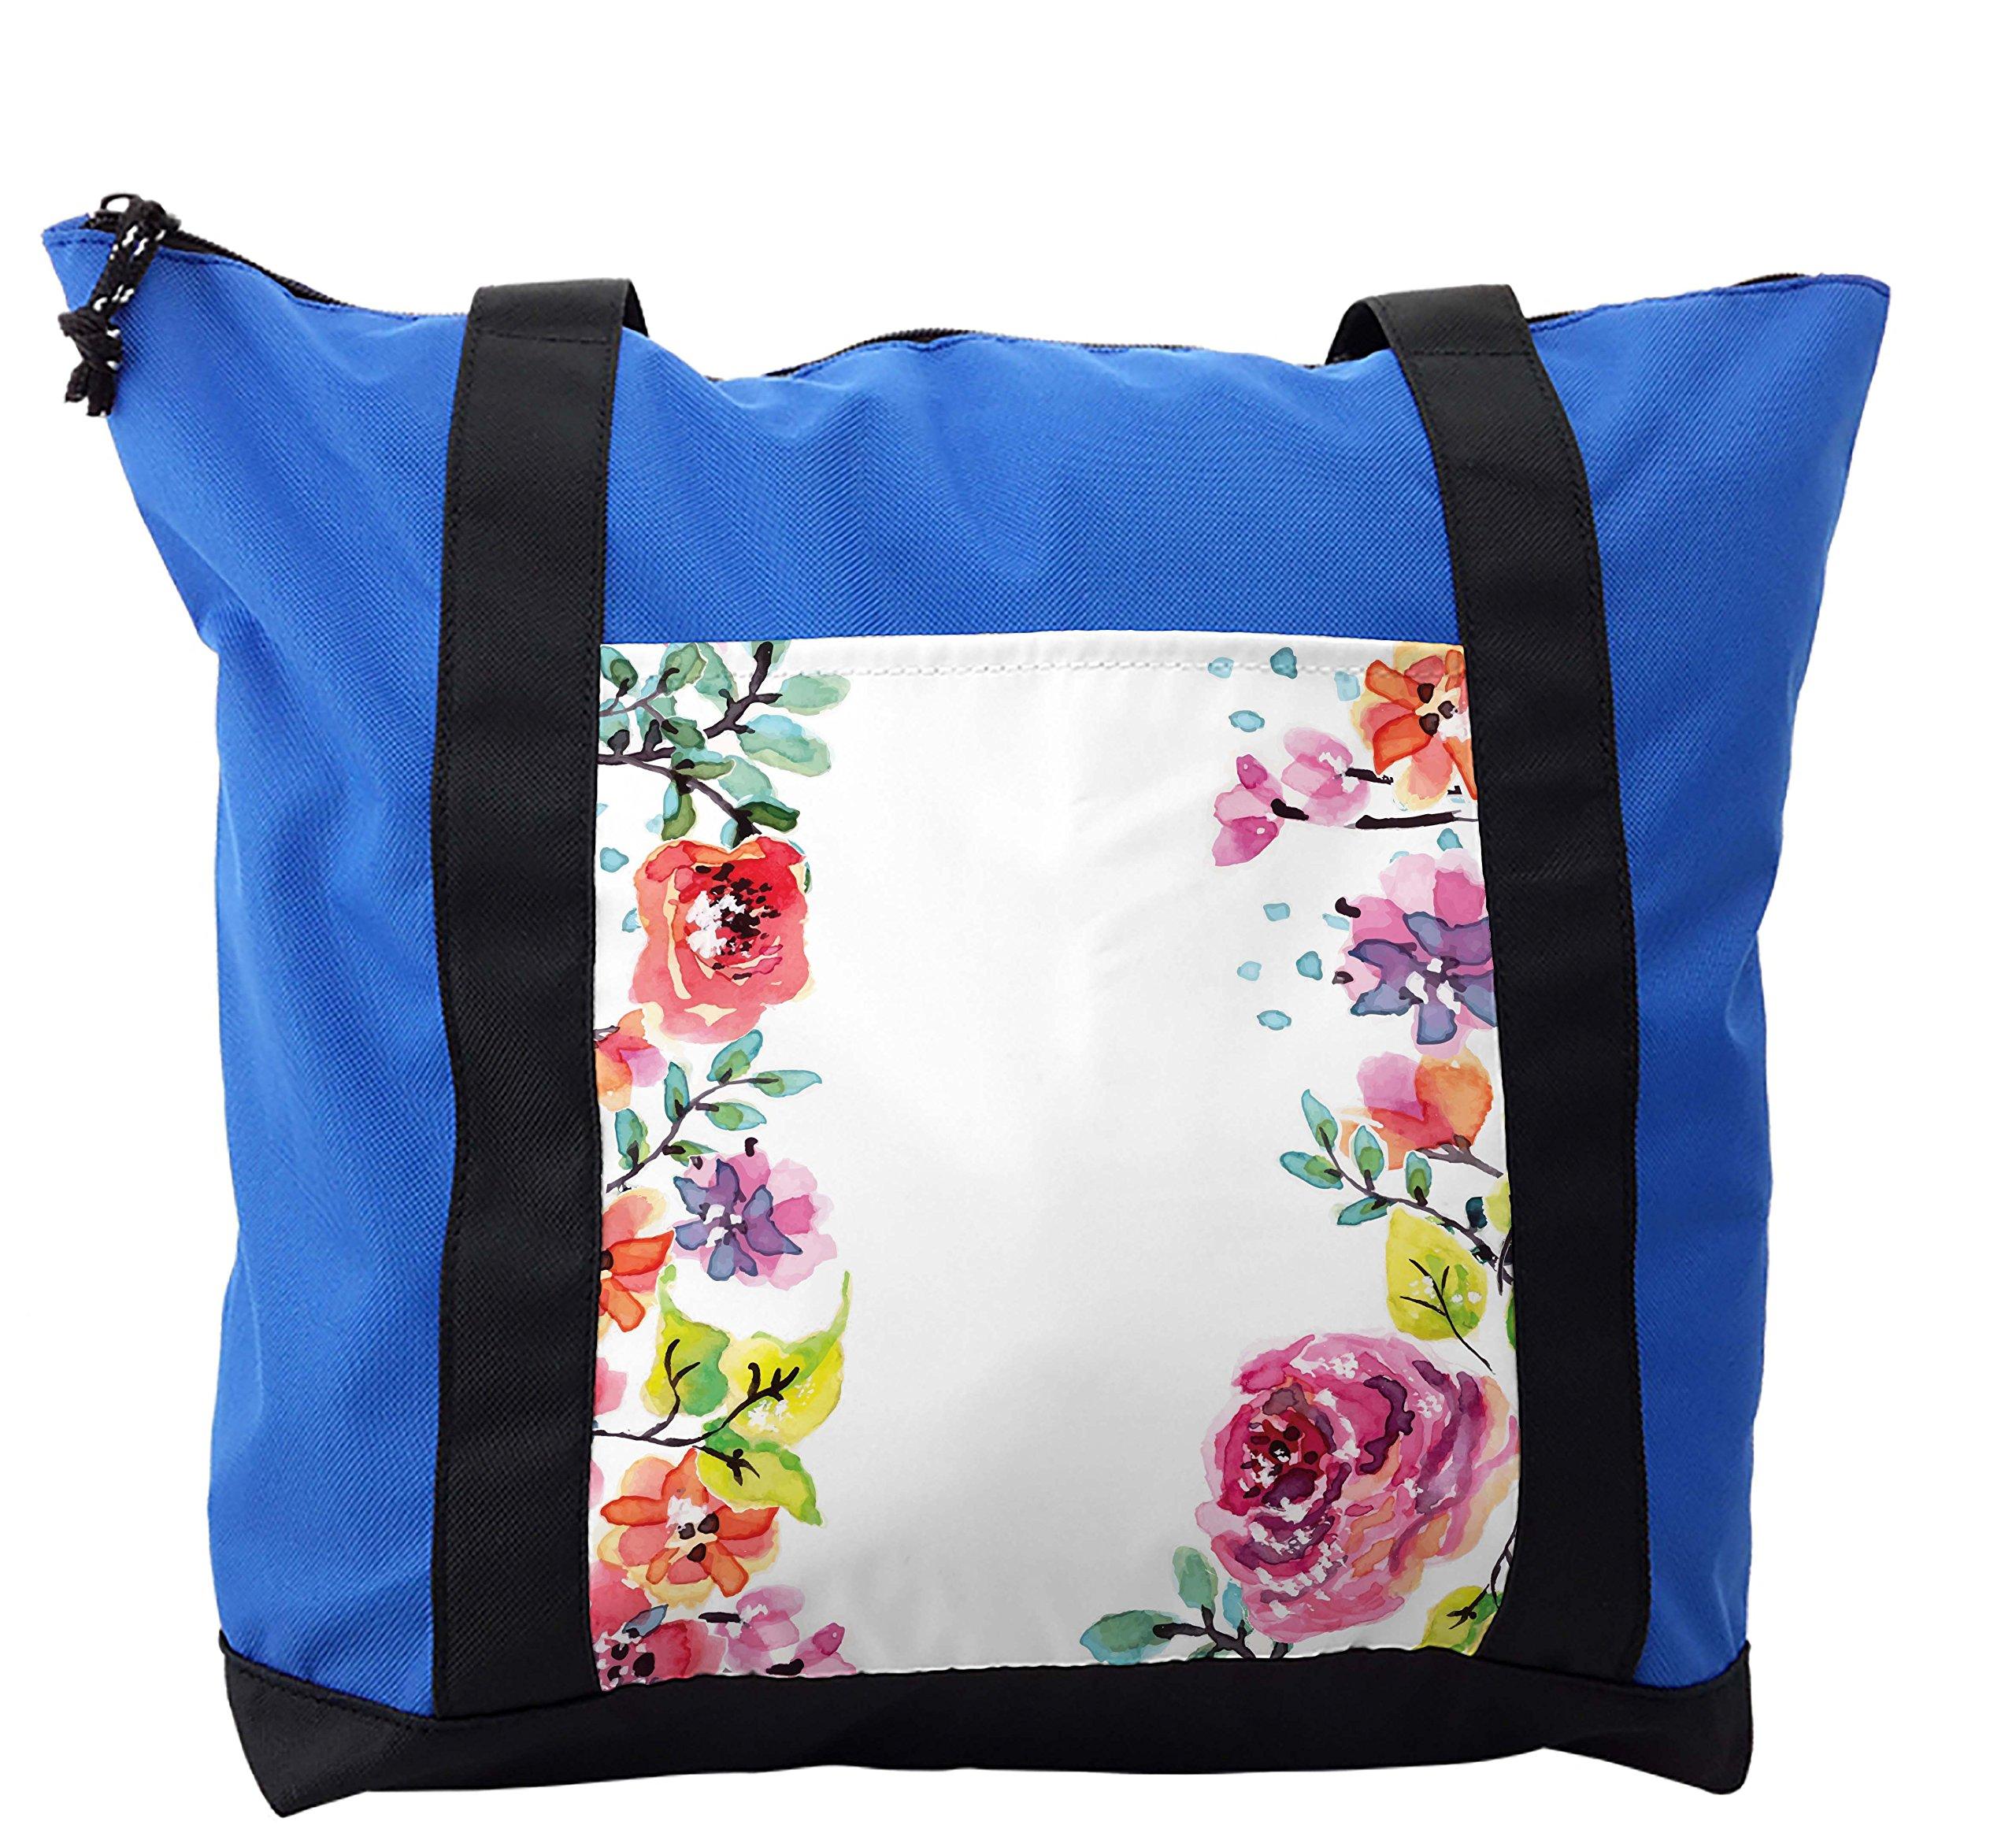 Lunarable Watercolor Flower Shoulder Bag, Summer Rose Motif, Durable with Zipper